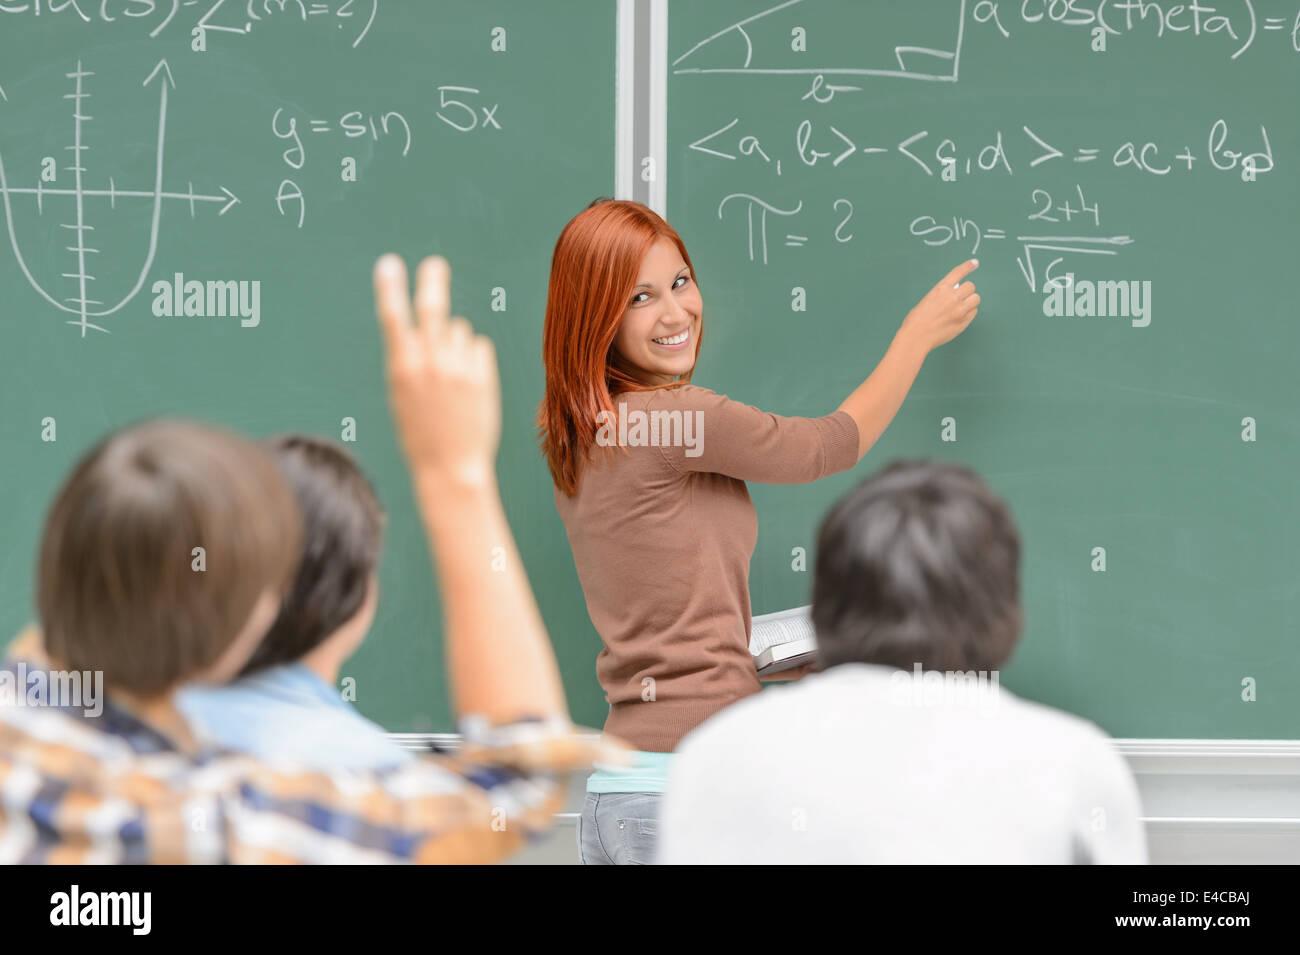 math-lesson-student-write-on-green-chalk